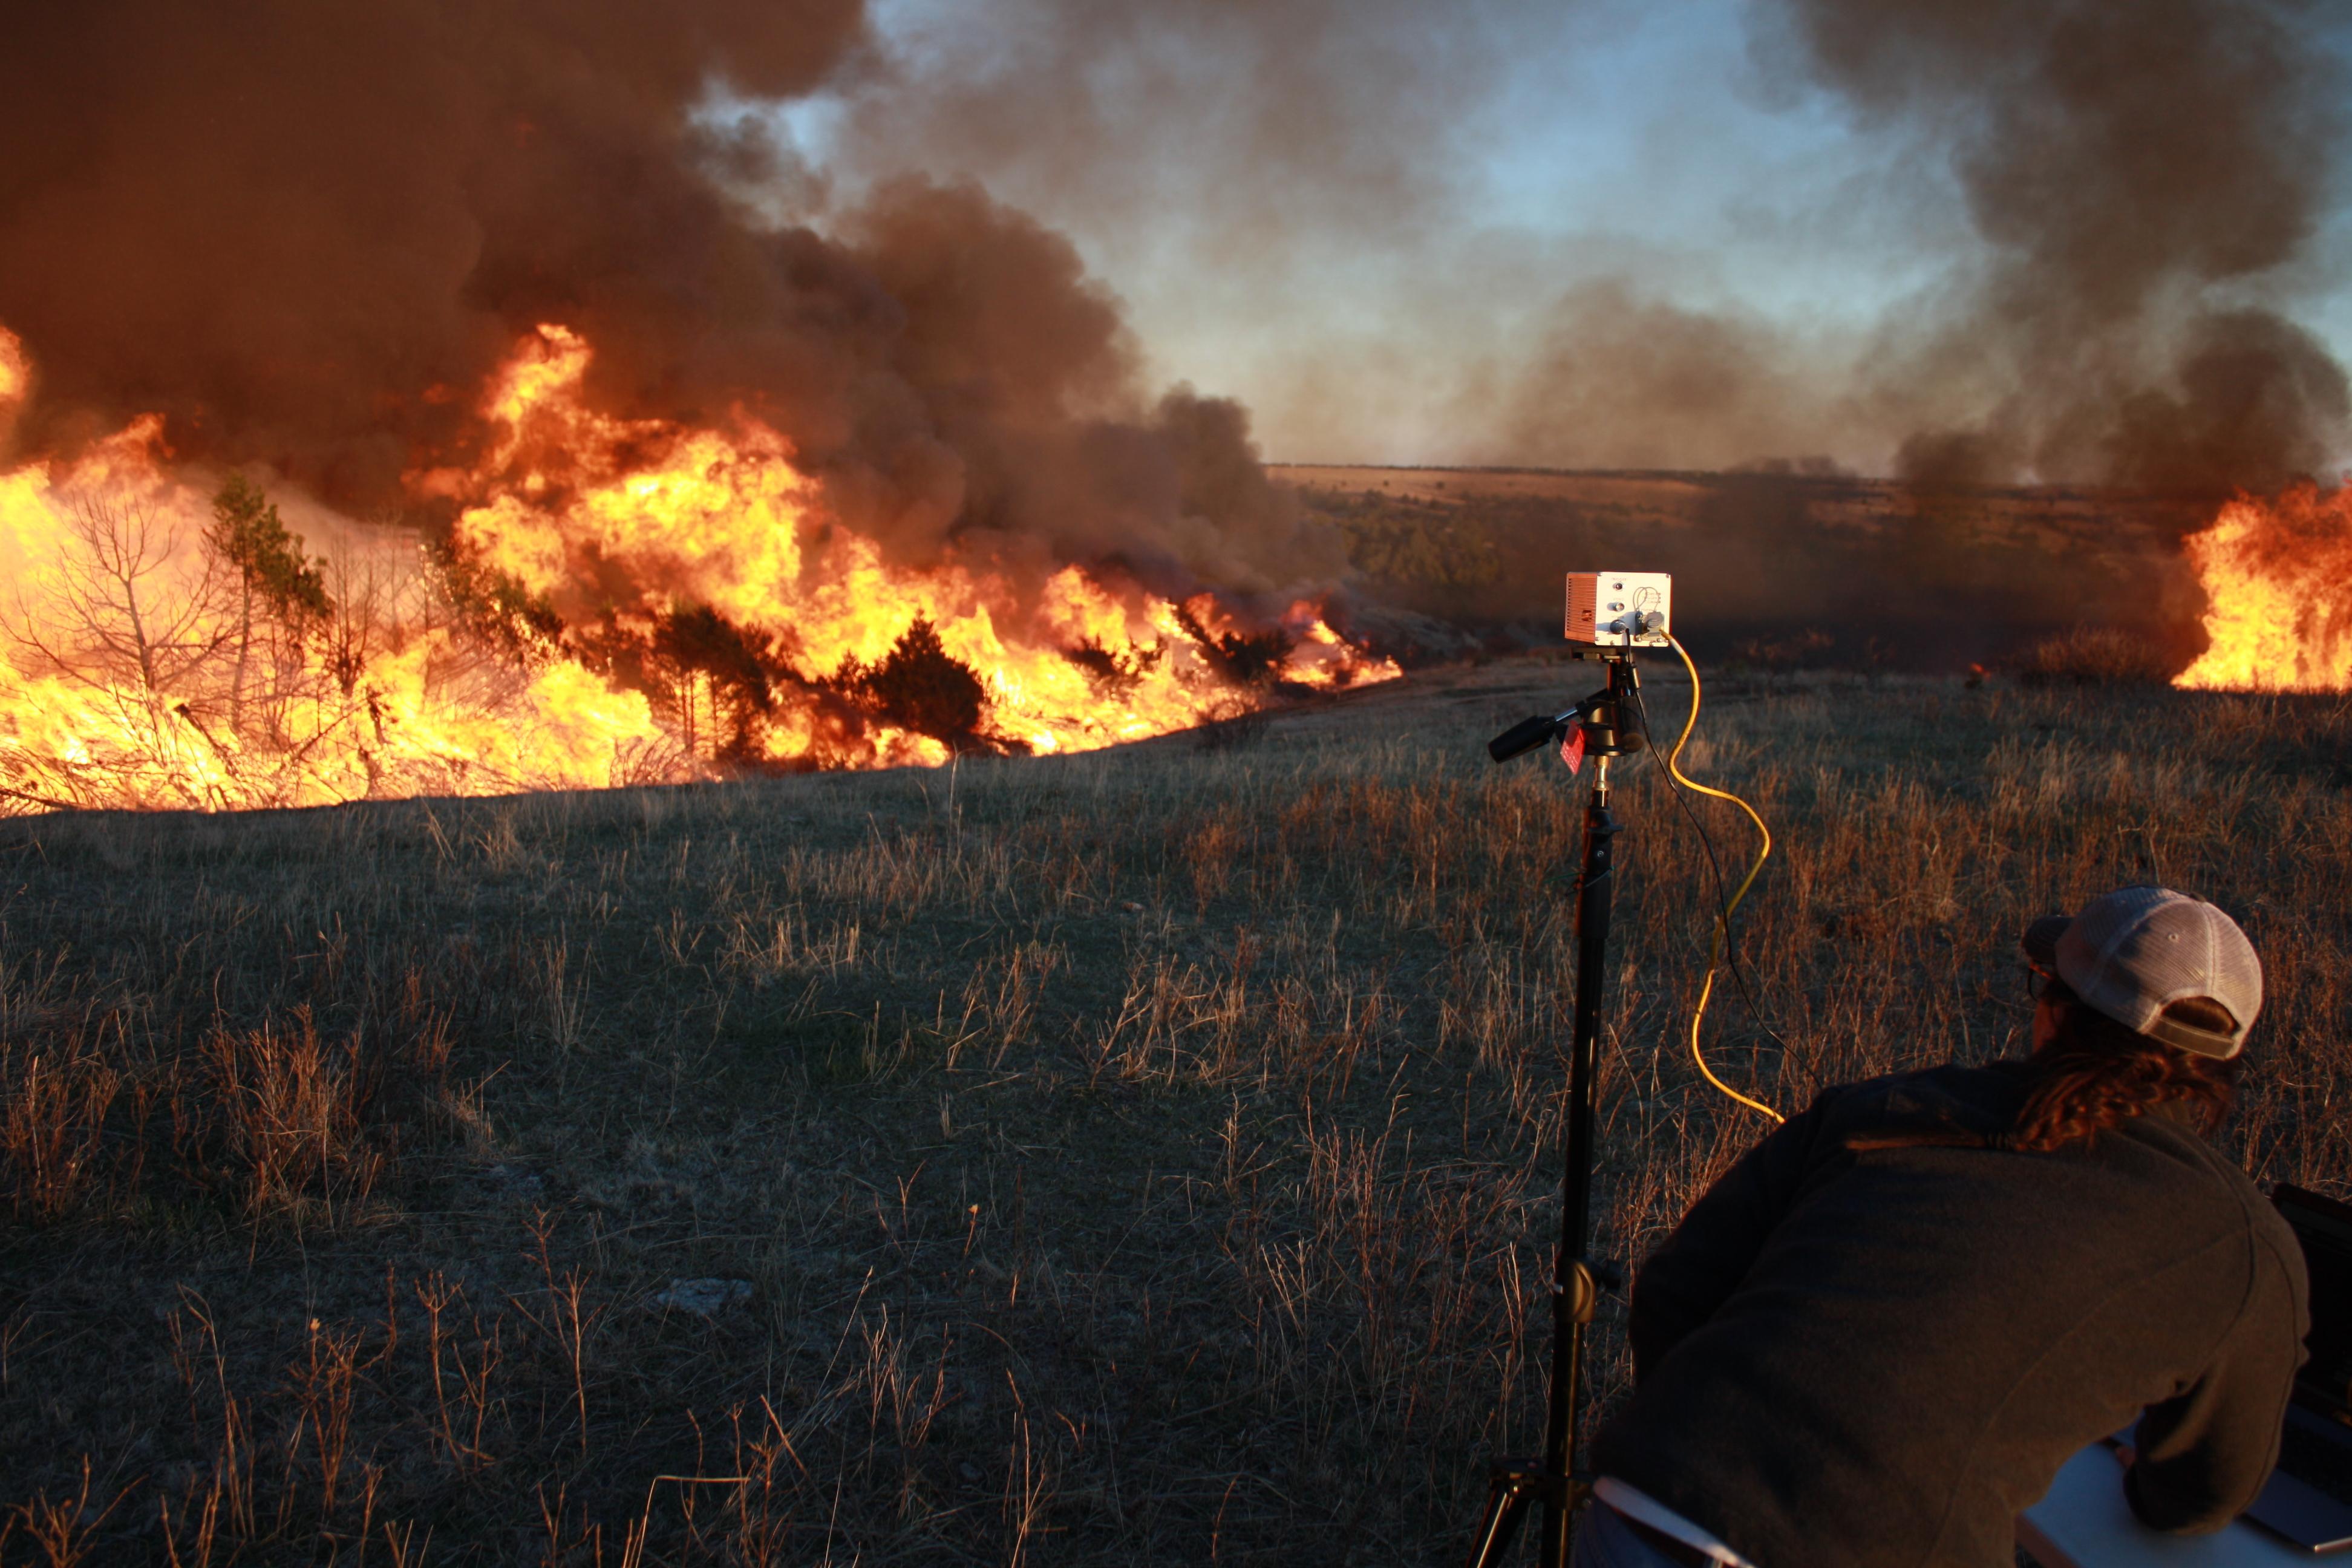 Graduate student Christina Bielski recorded data during a high intensity prescribed fire burning through juniper-invaded grassland on private property. Credit, Dirac Twidwell.